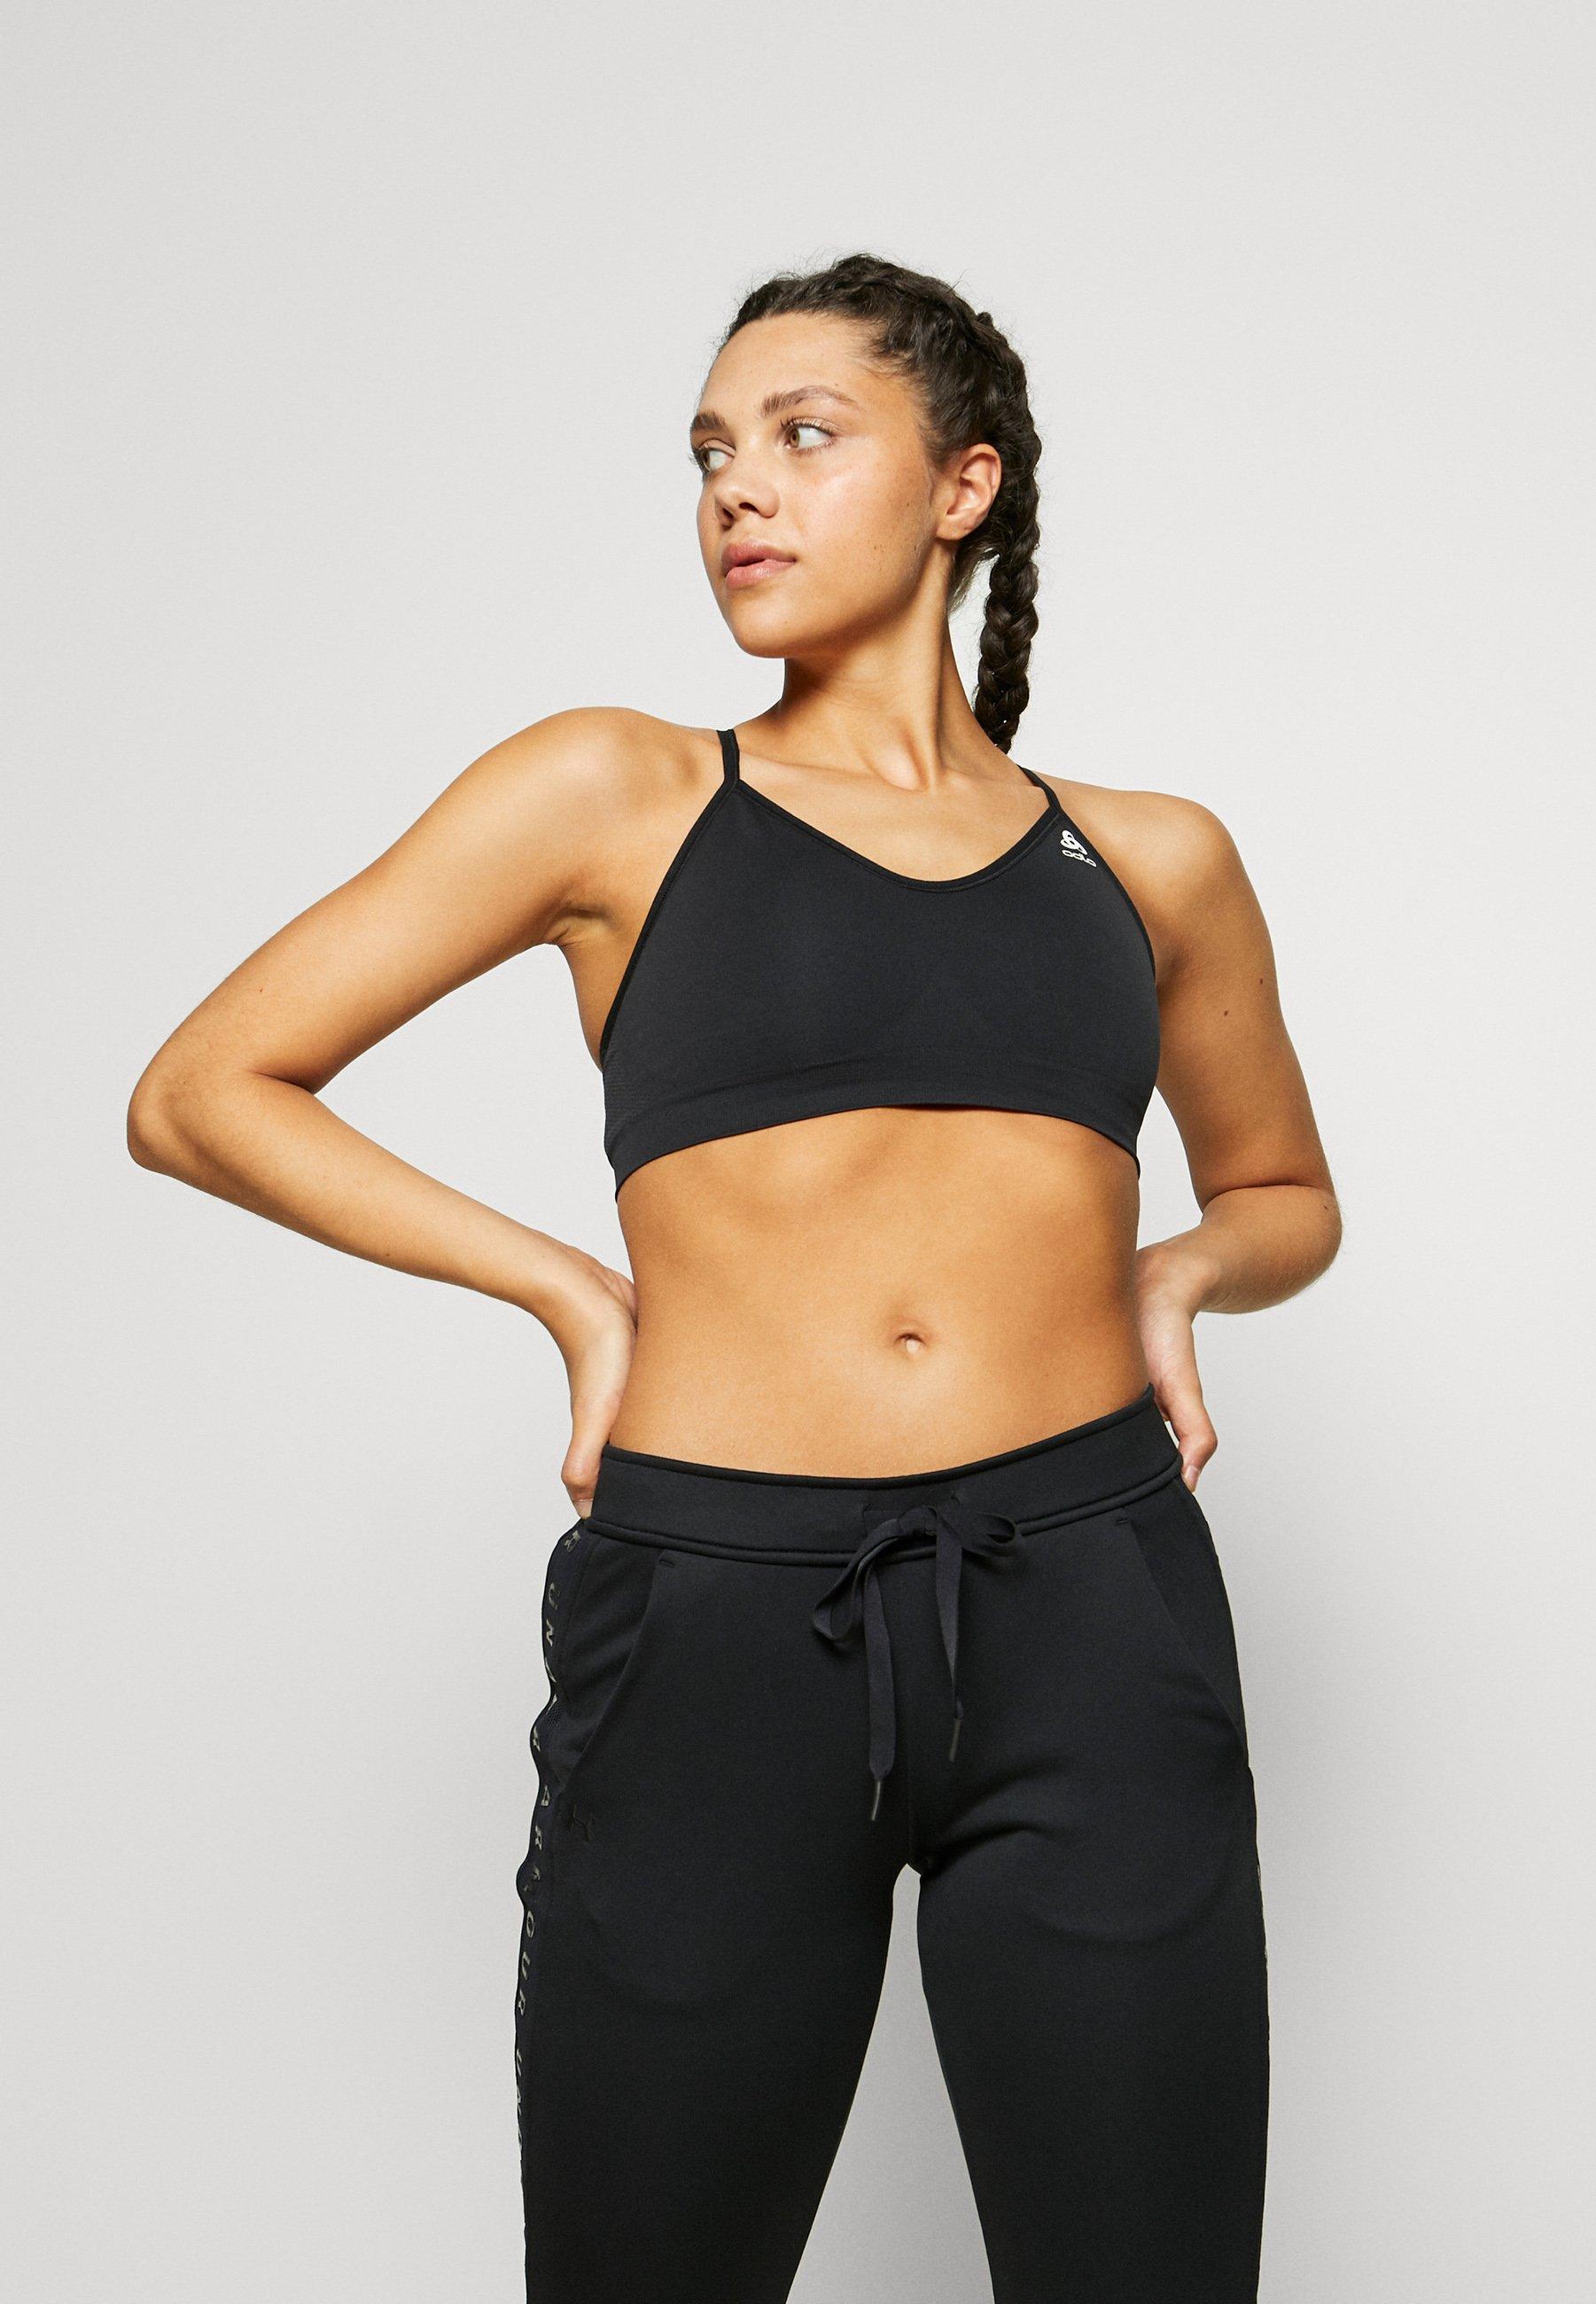 Femme SEAMLESS SOFT SPORTS BRA - Brassières de sport à maintien léger